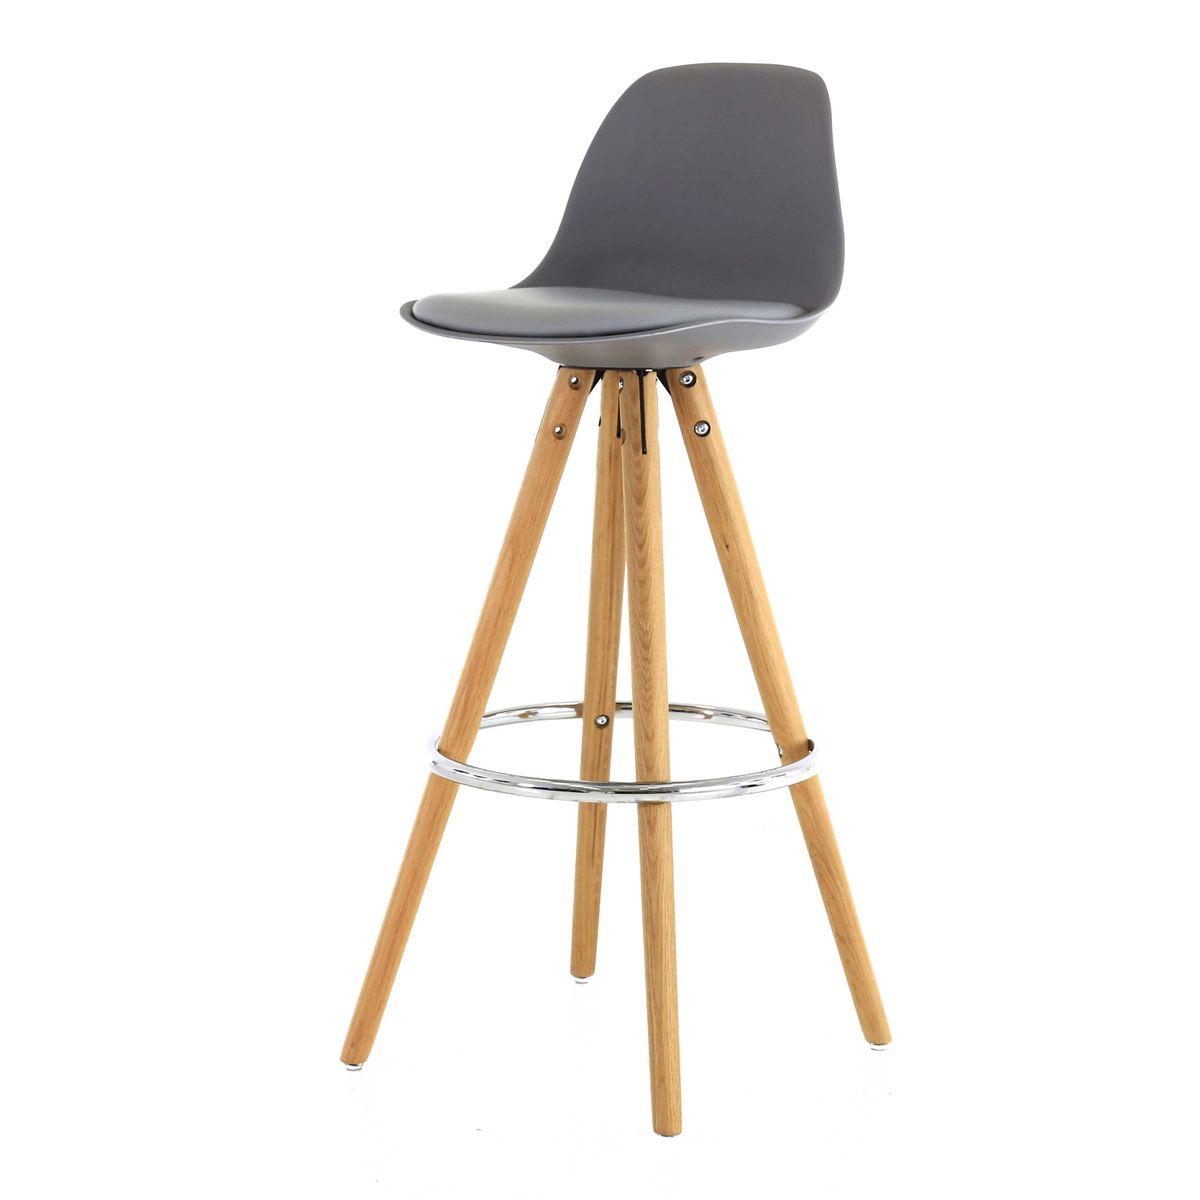 2x chaise de bar haute circus zago store. Black Bedroom Furniture Sets. Home Design Ideas